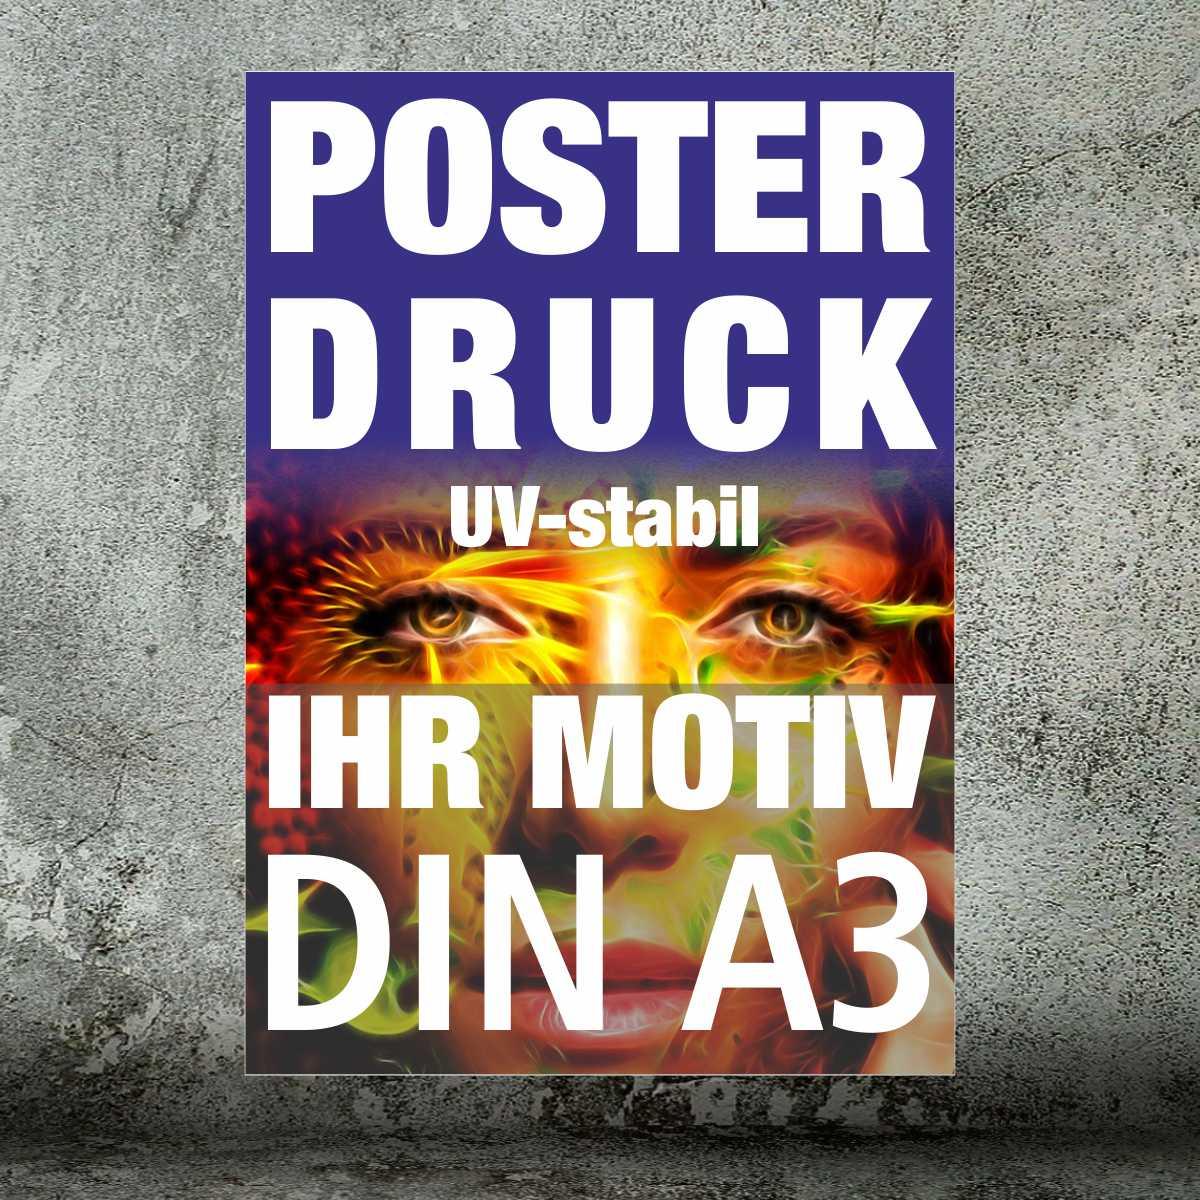 Plakate und Poster · DIN A3 4/0-farbig (ab 1 Stück)